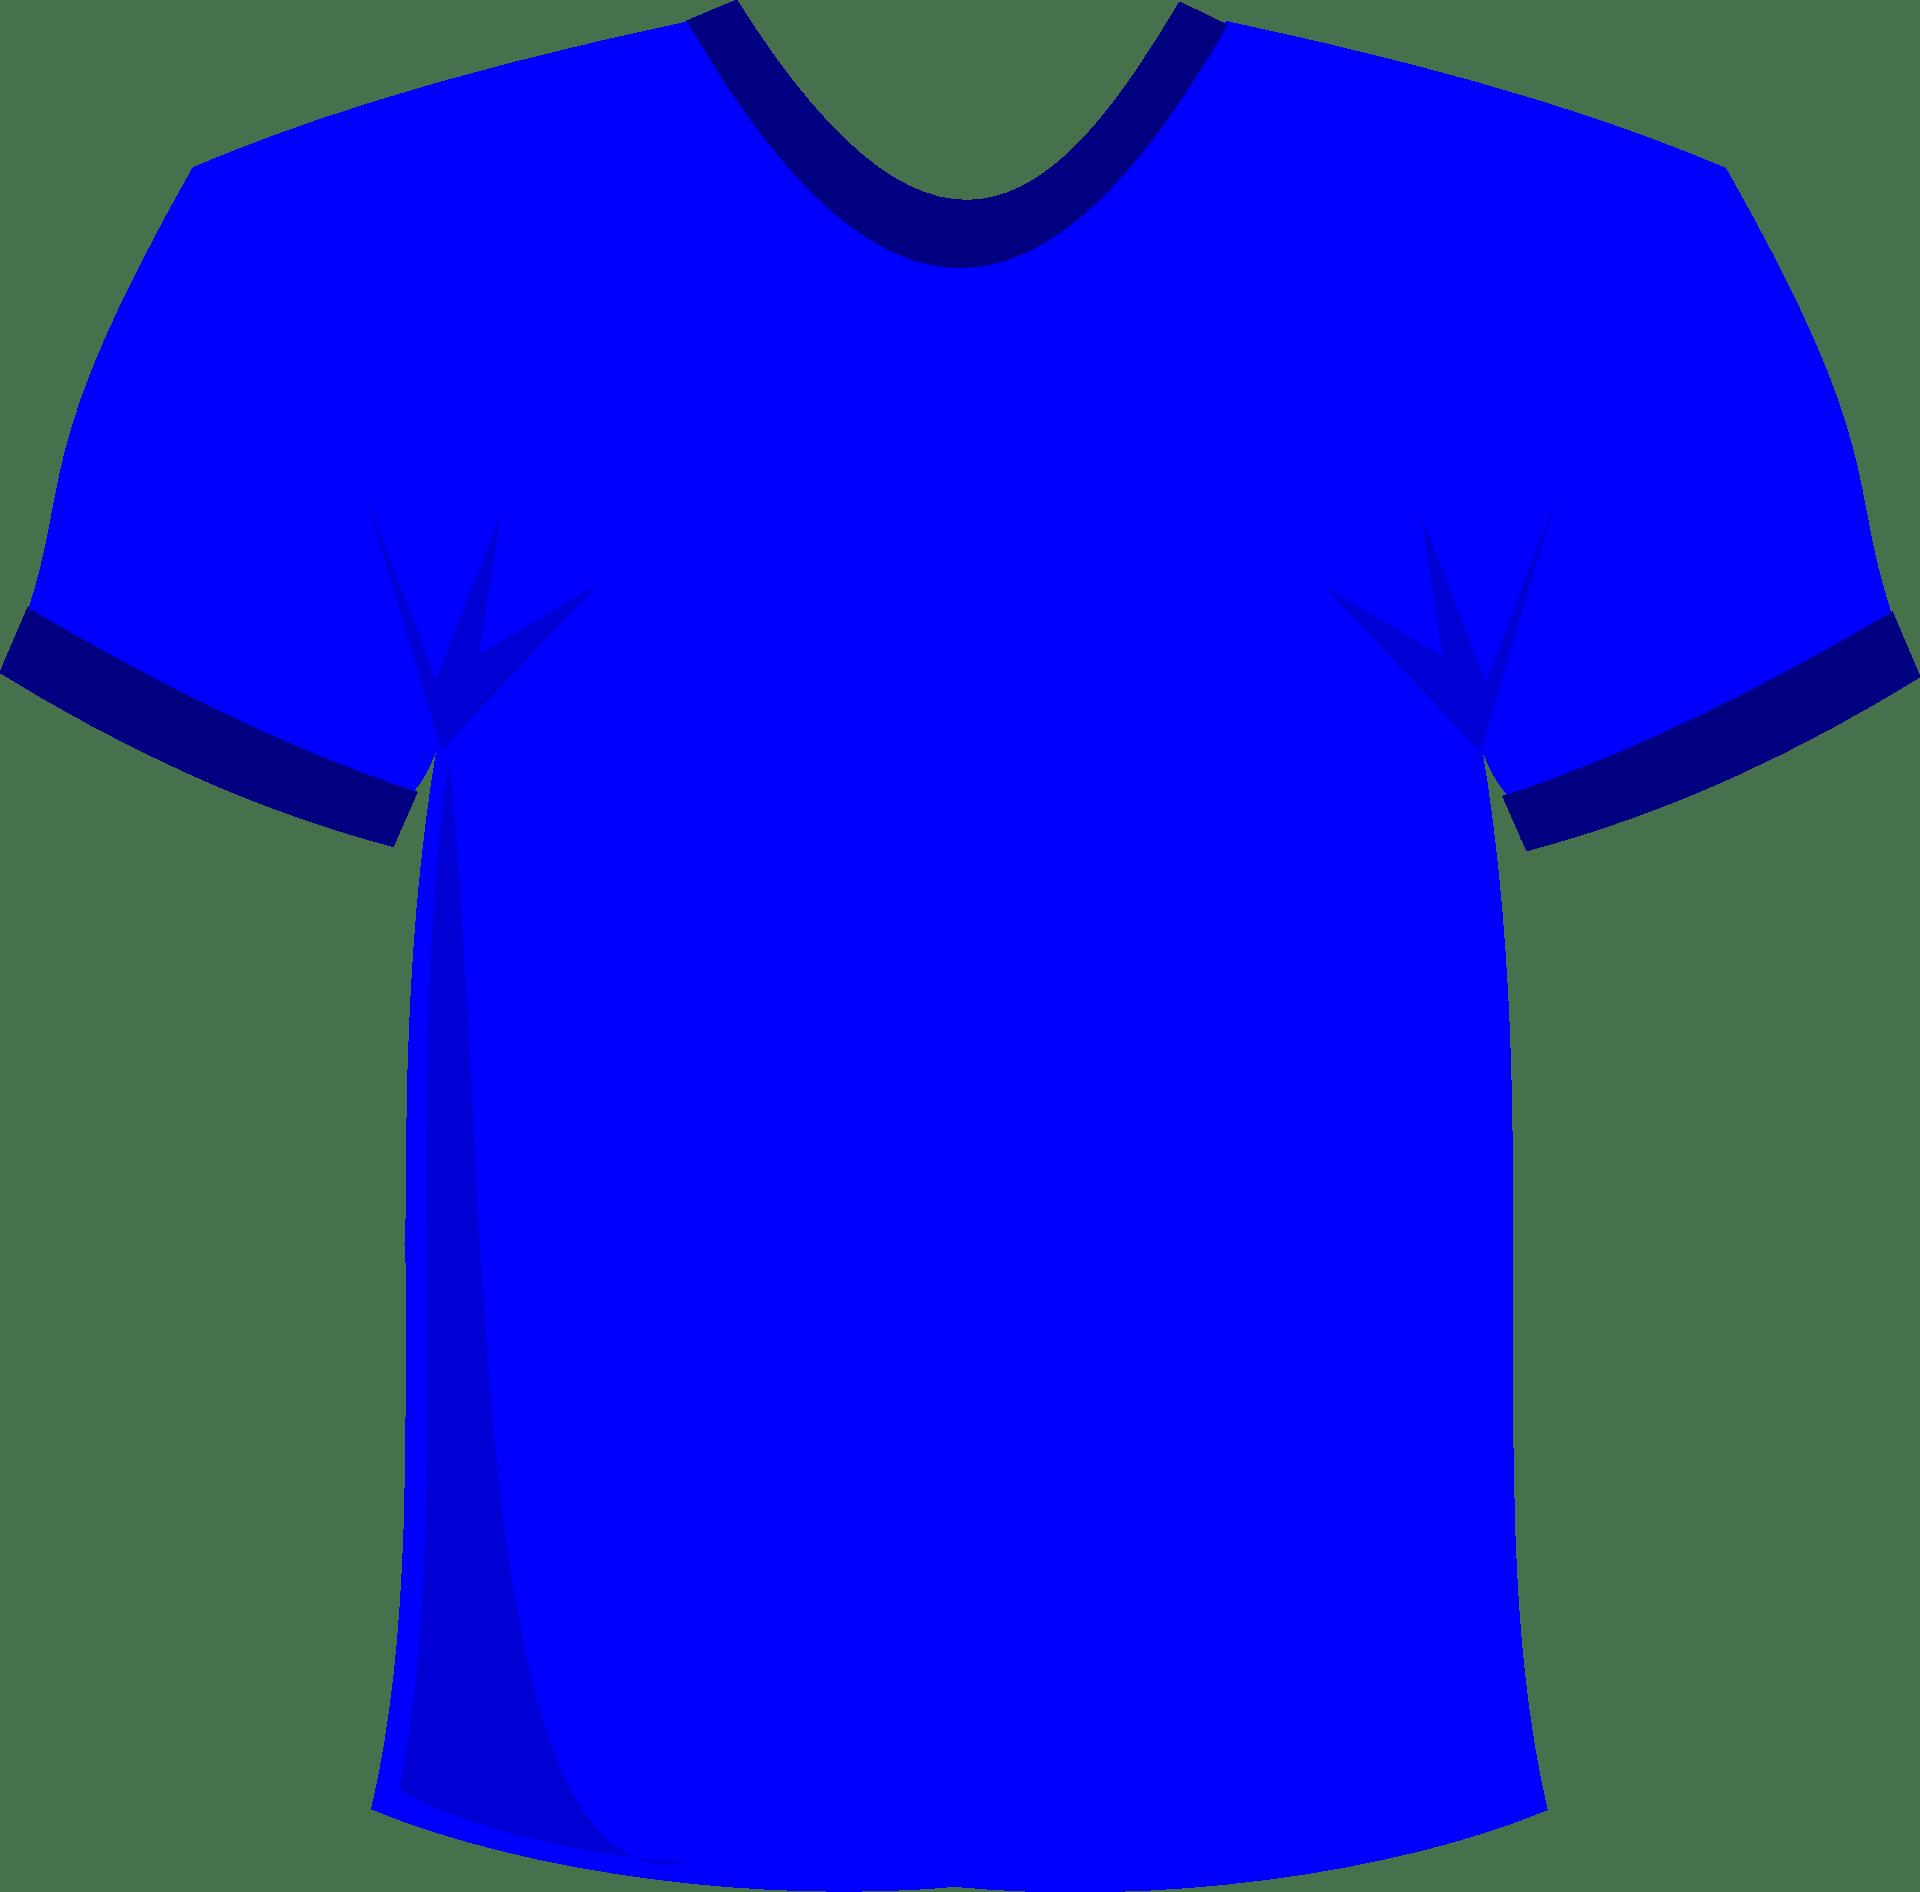 Blue,short sleeved T-shirt vector